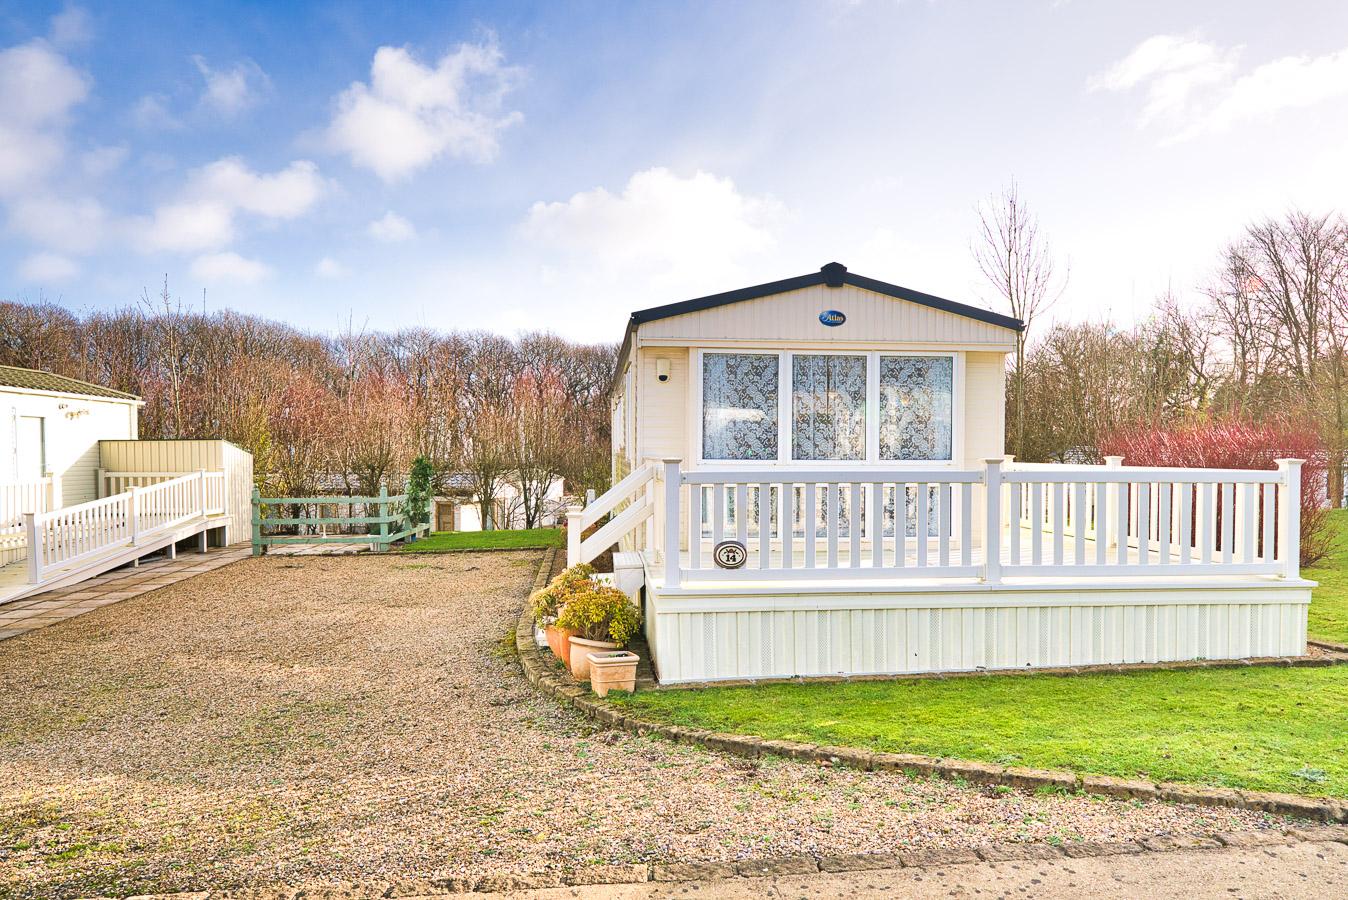 Best-Holiday-Static-Caravan-Sale-Charmouth-Lyme-Regis-Monkton-Wyld-2